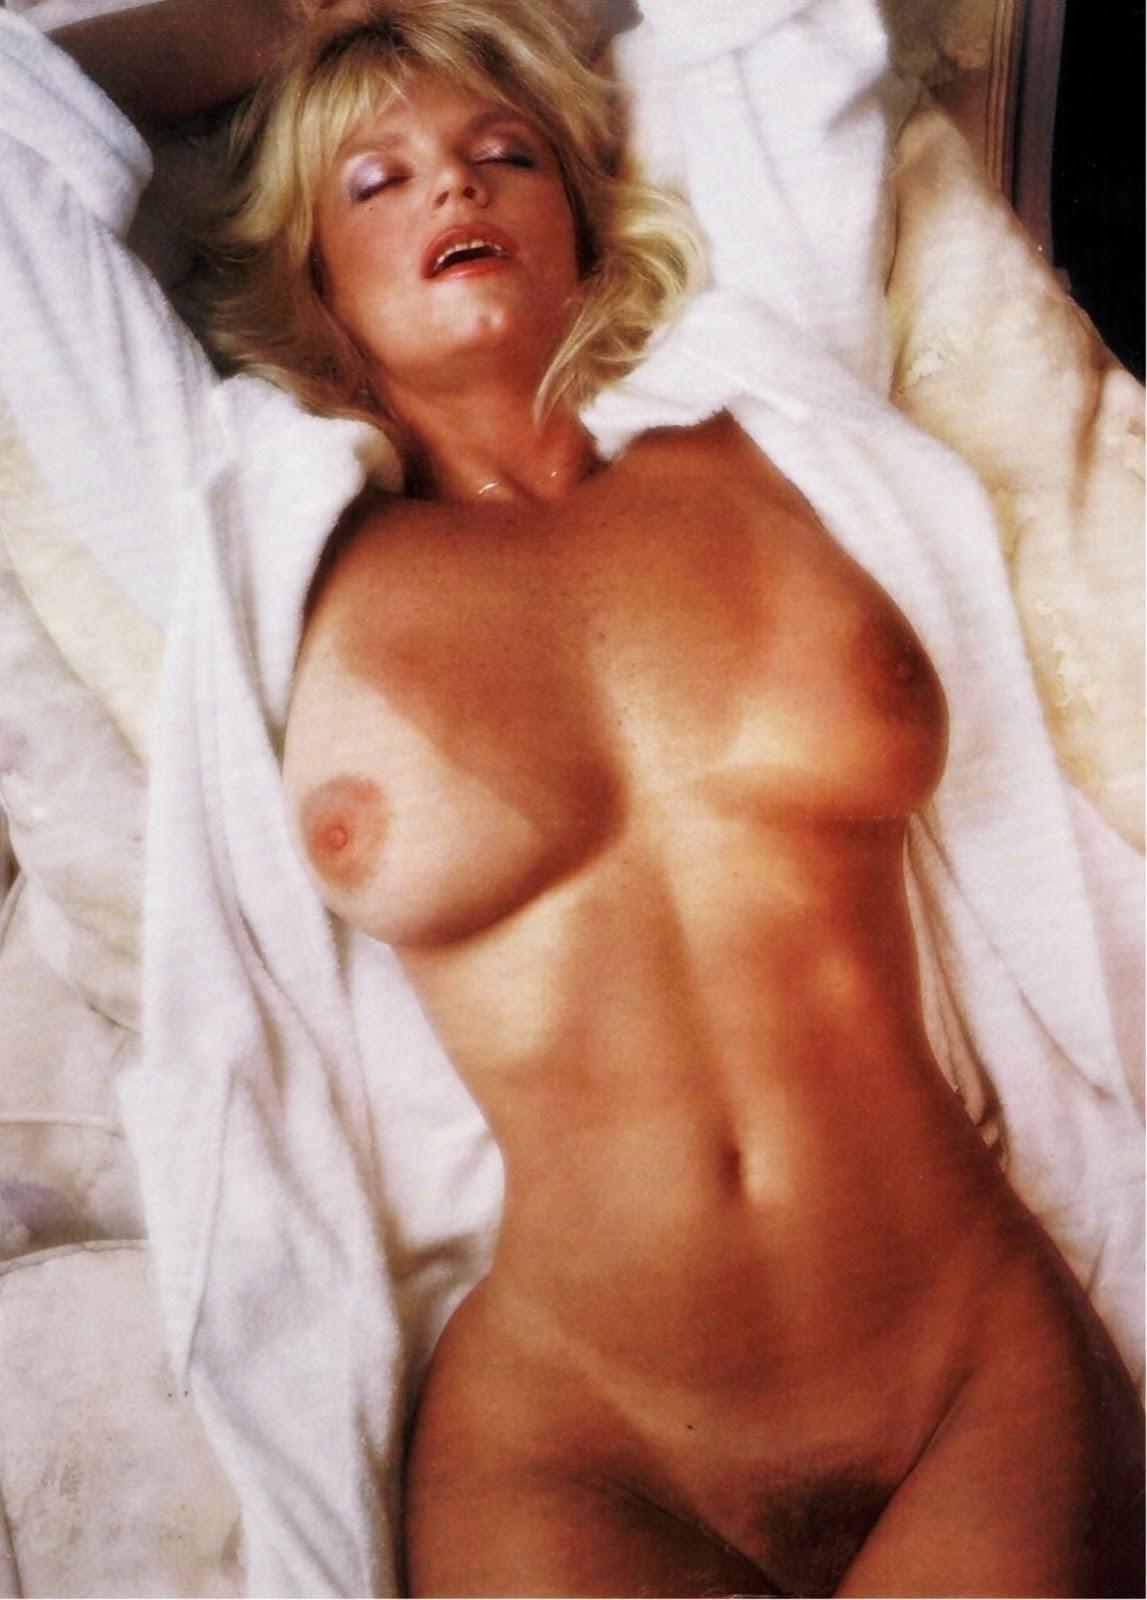 sexy fake porn doda - porn pics & movies